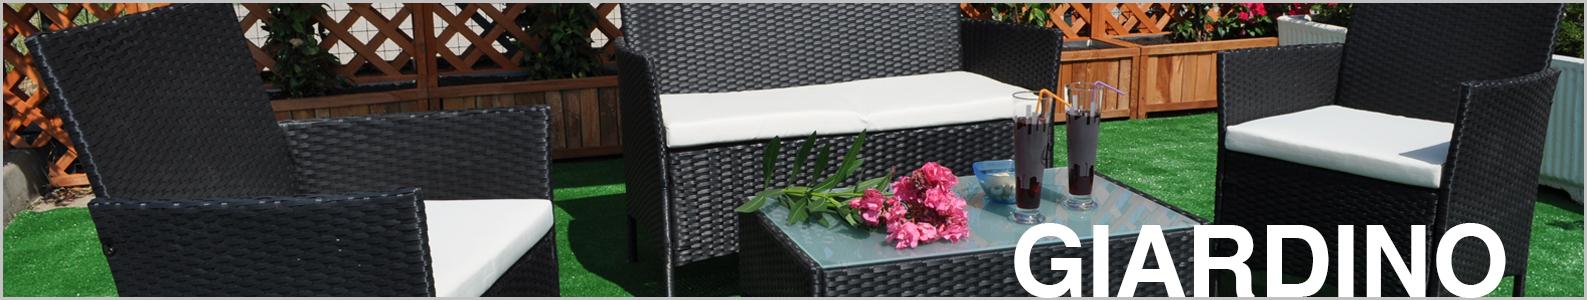 Dondolo da giardino 3 posti con tettuccio regolabile mod. Barbados Dondoli